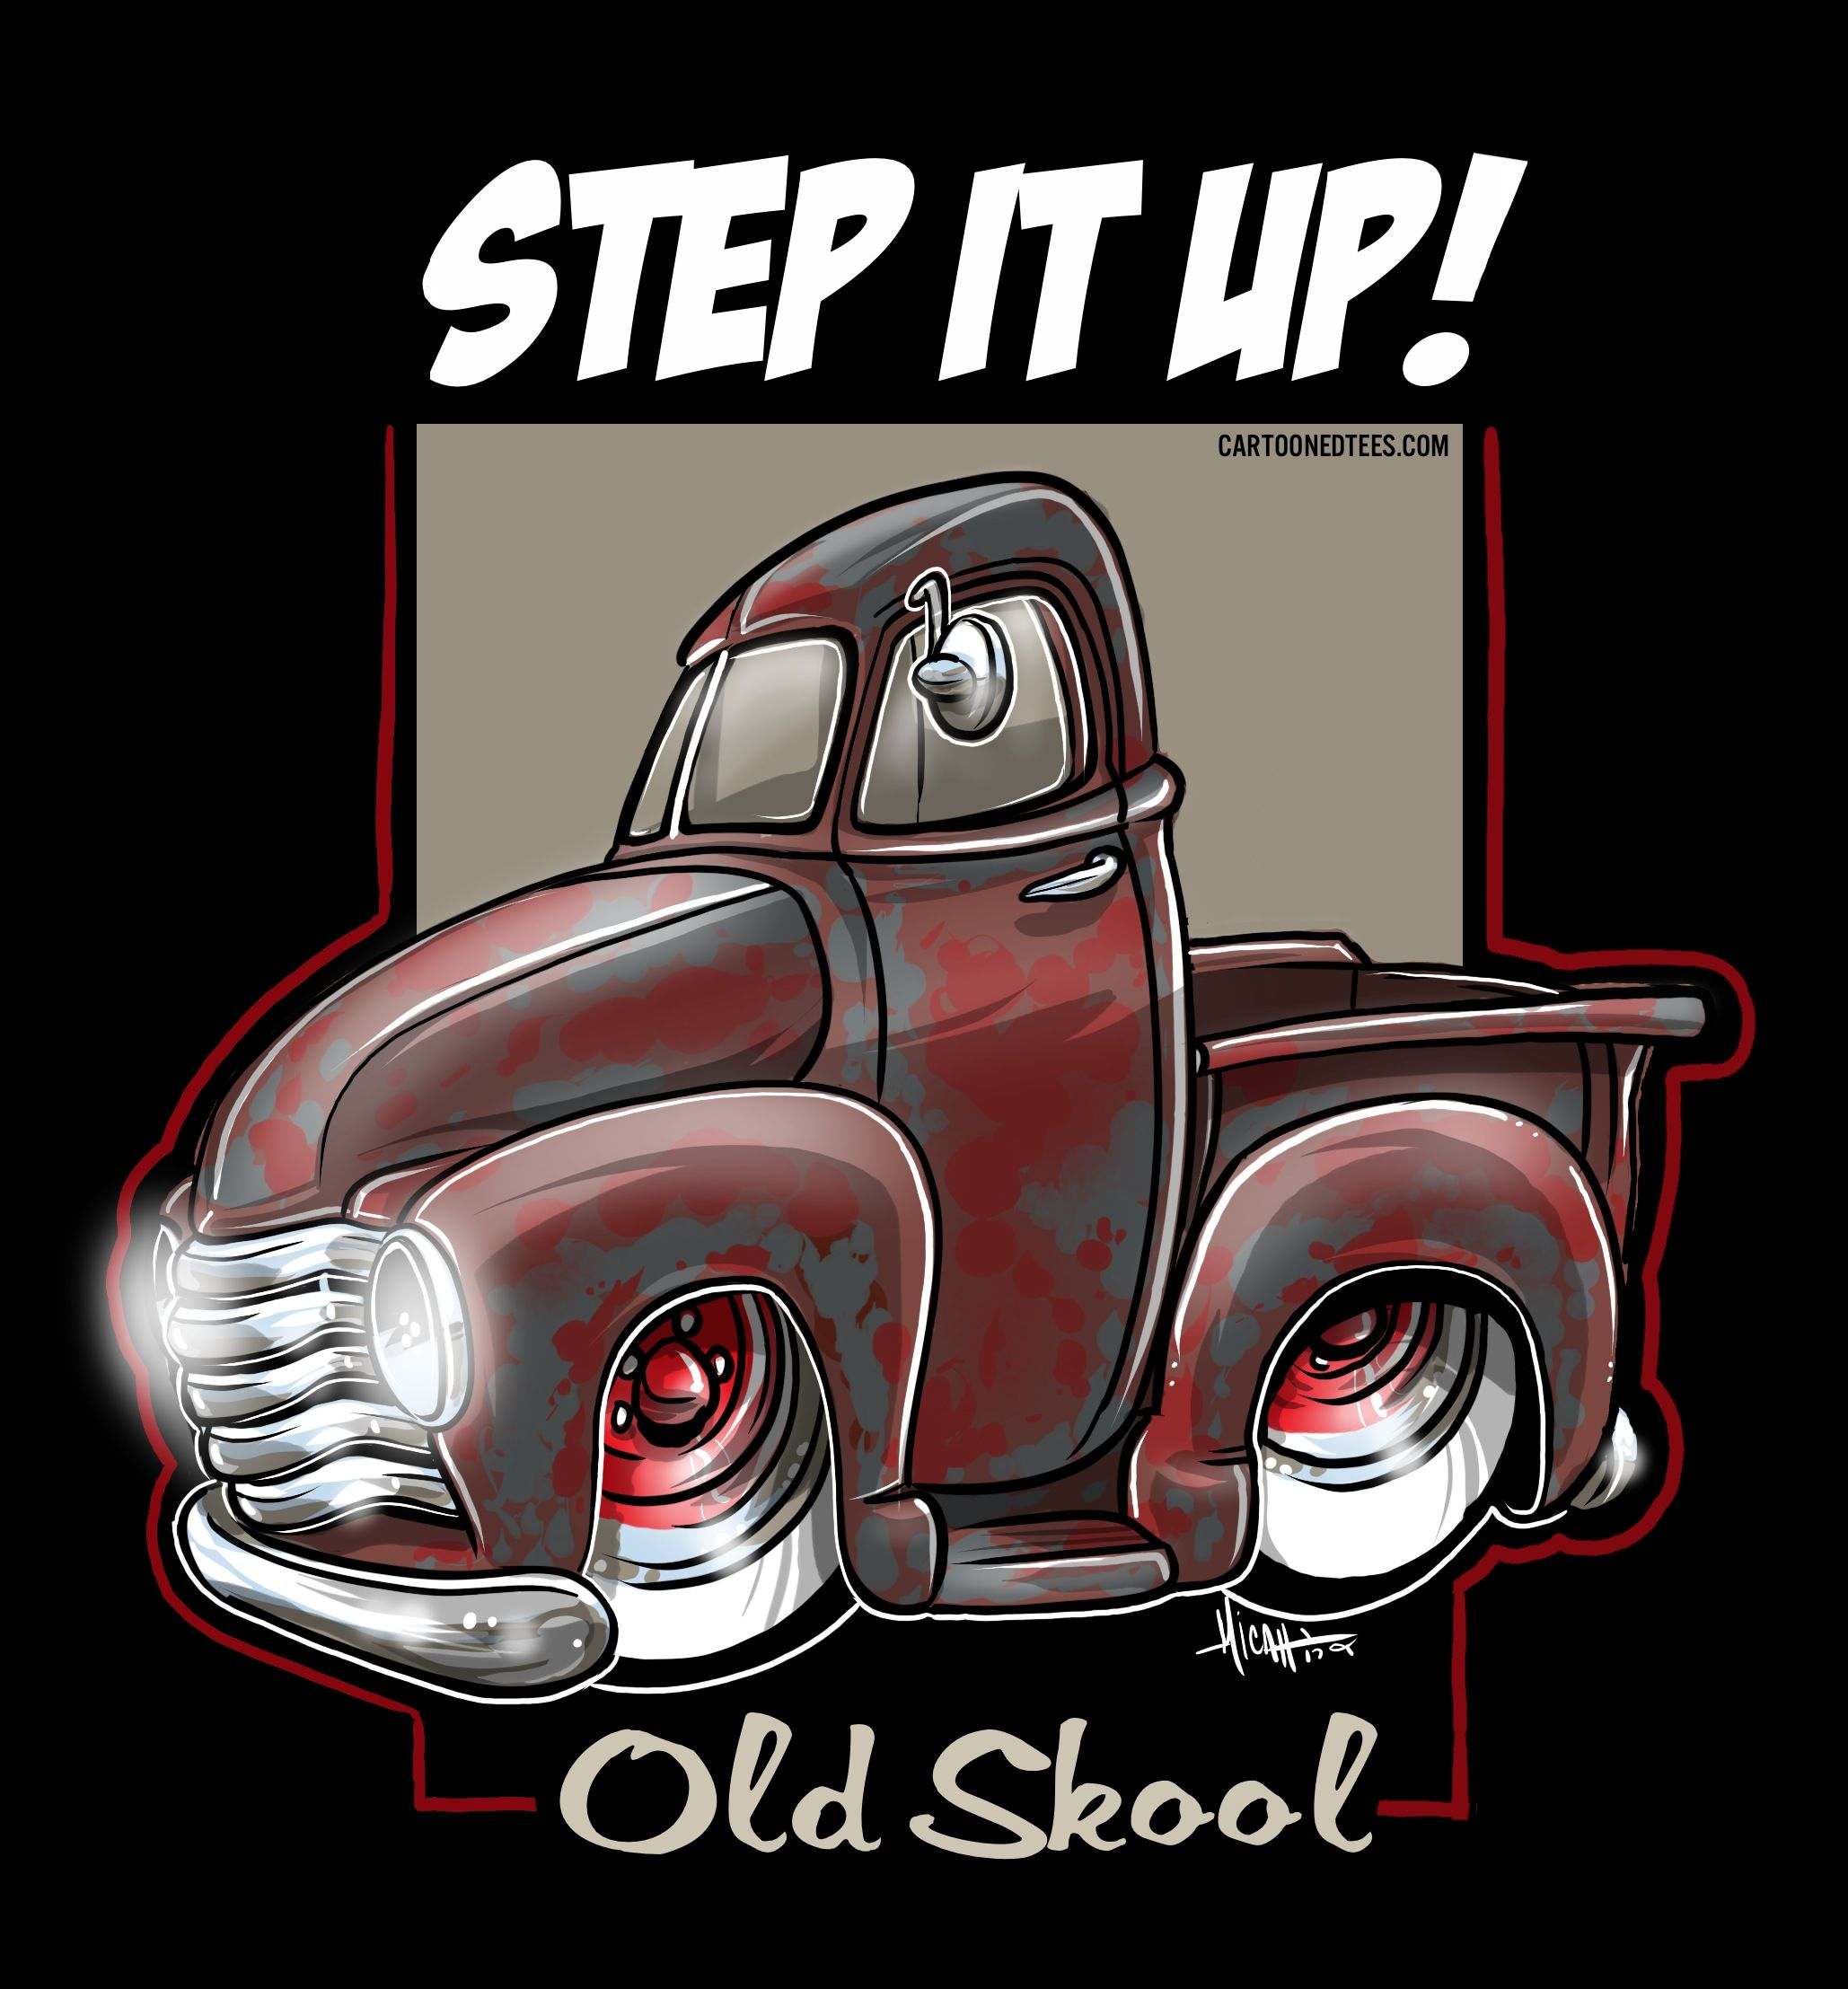 Order this shirt today at cartoonedtees.com • drawn by micahdoodles ...